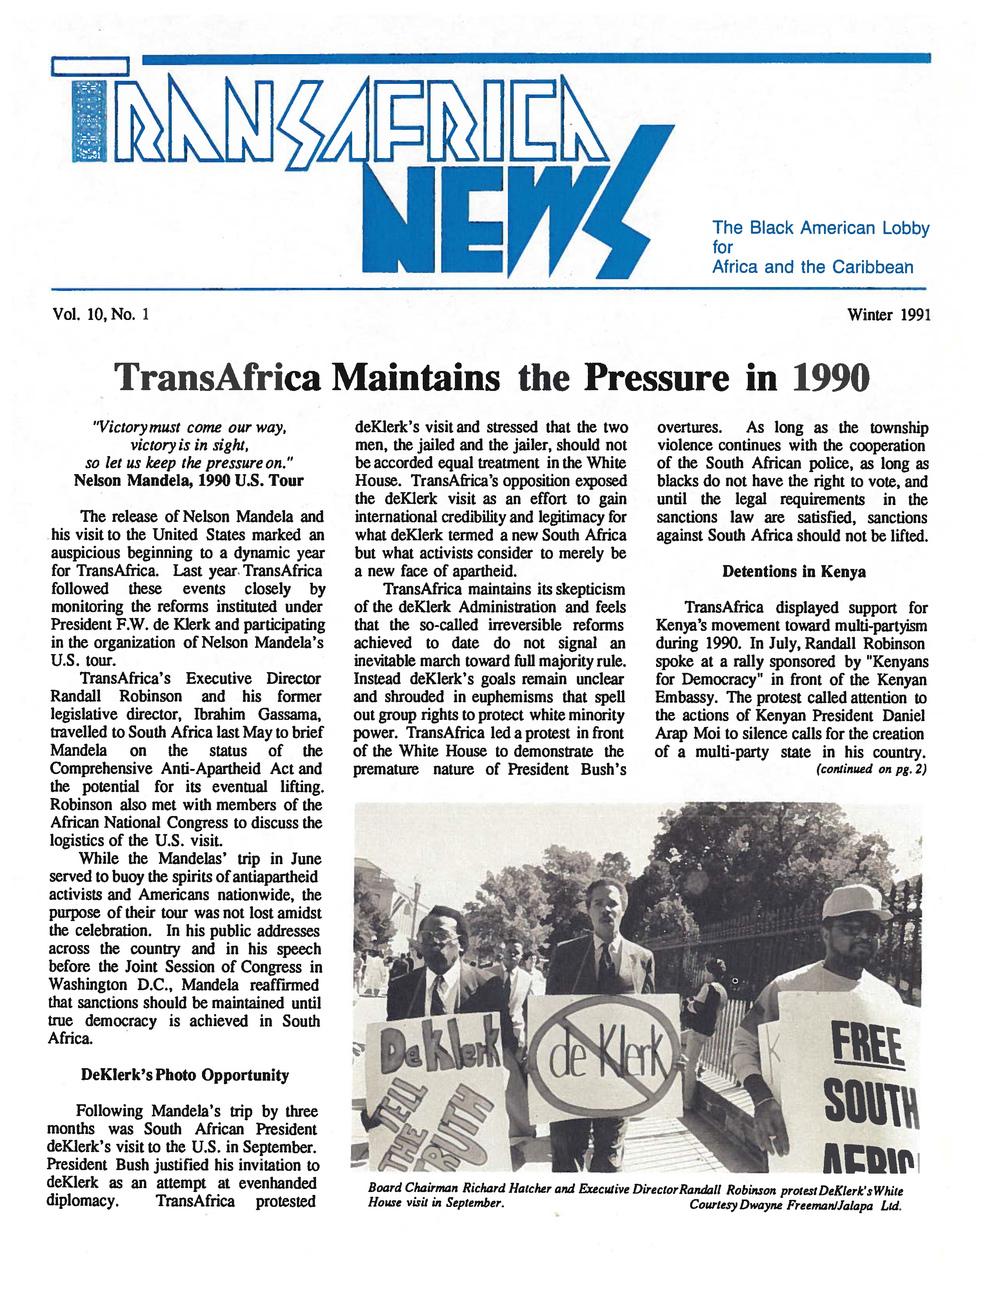 TransAfrica News Vol. 10, No. 1